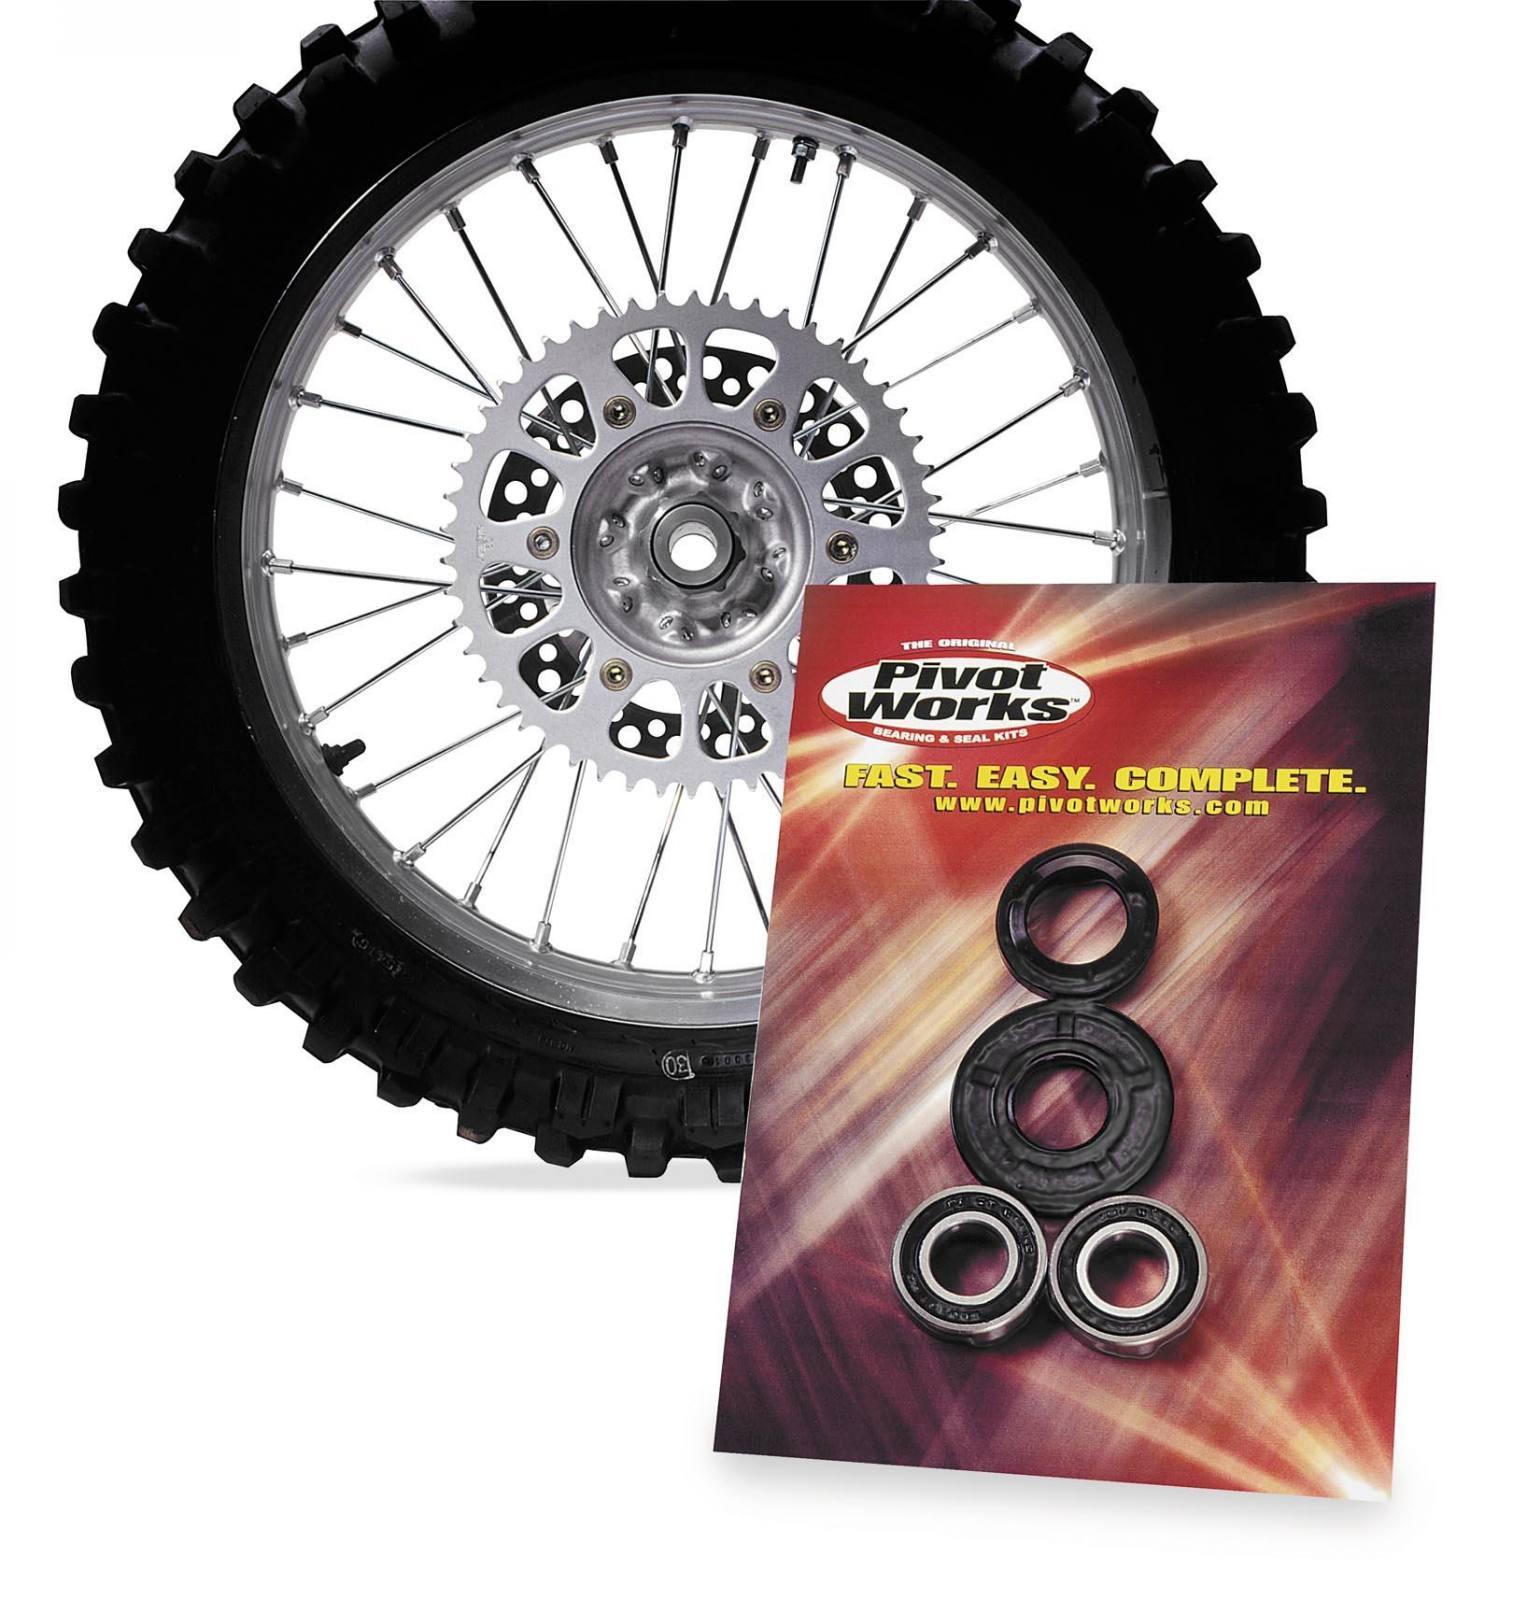 Wheel Bearing Kits For 2002 Honda TRX250TE FourTrax Recon ES~Pivot Works